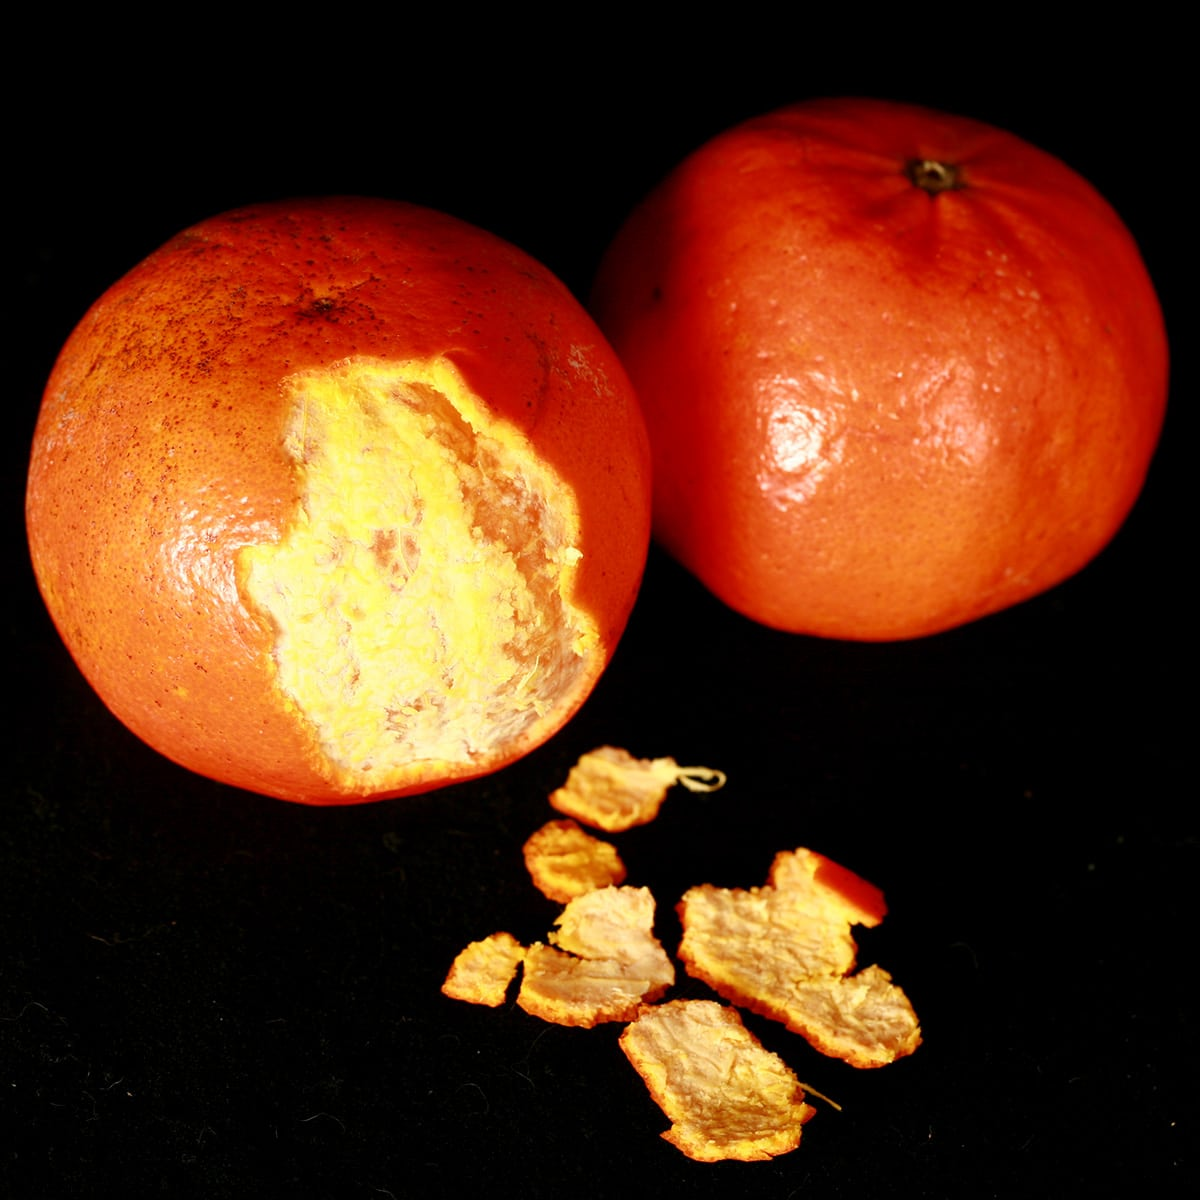 2 Sunburst Tangerine oranges, one peeled.